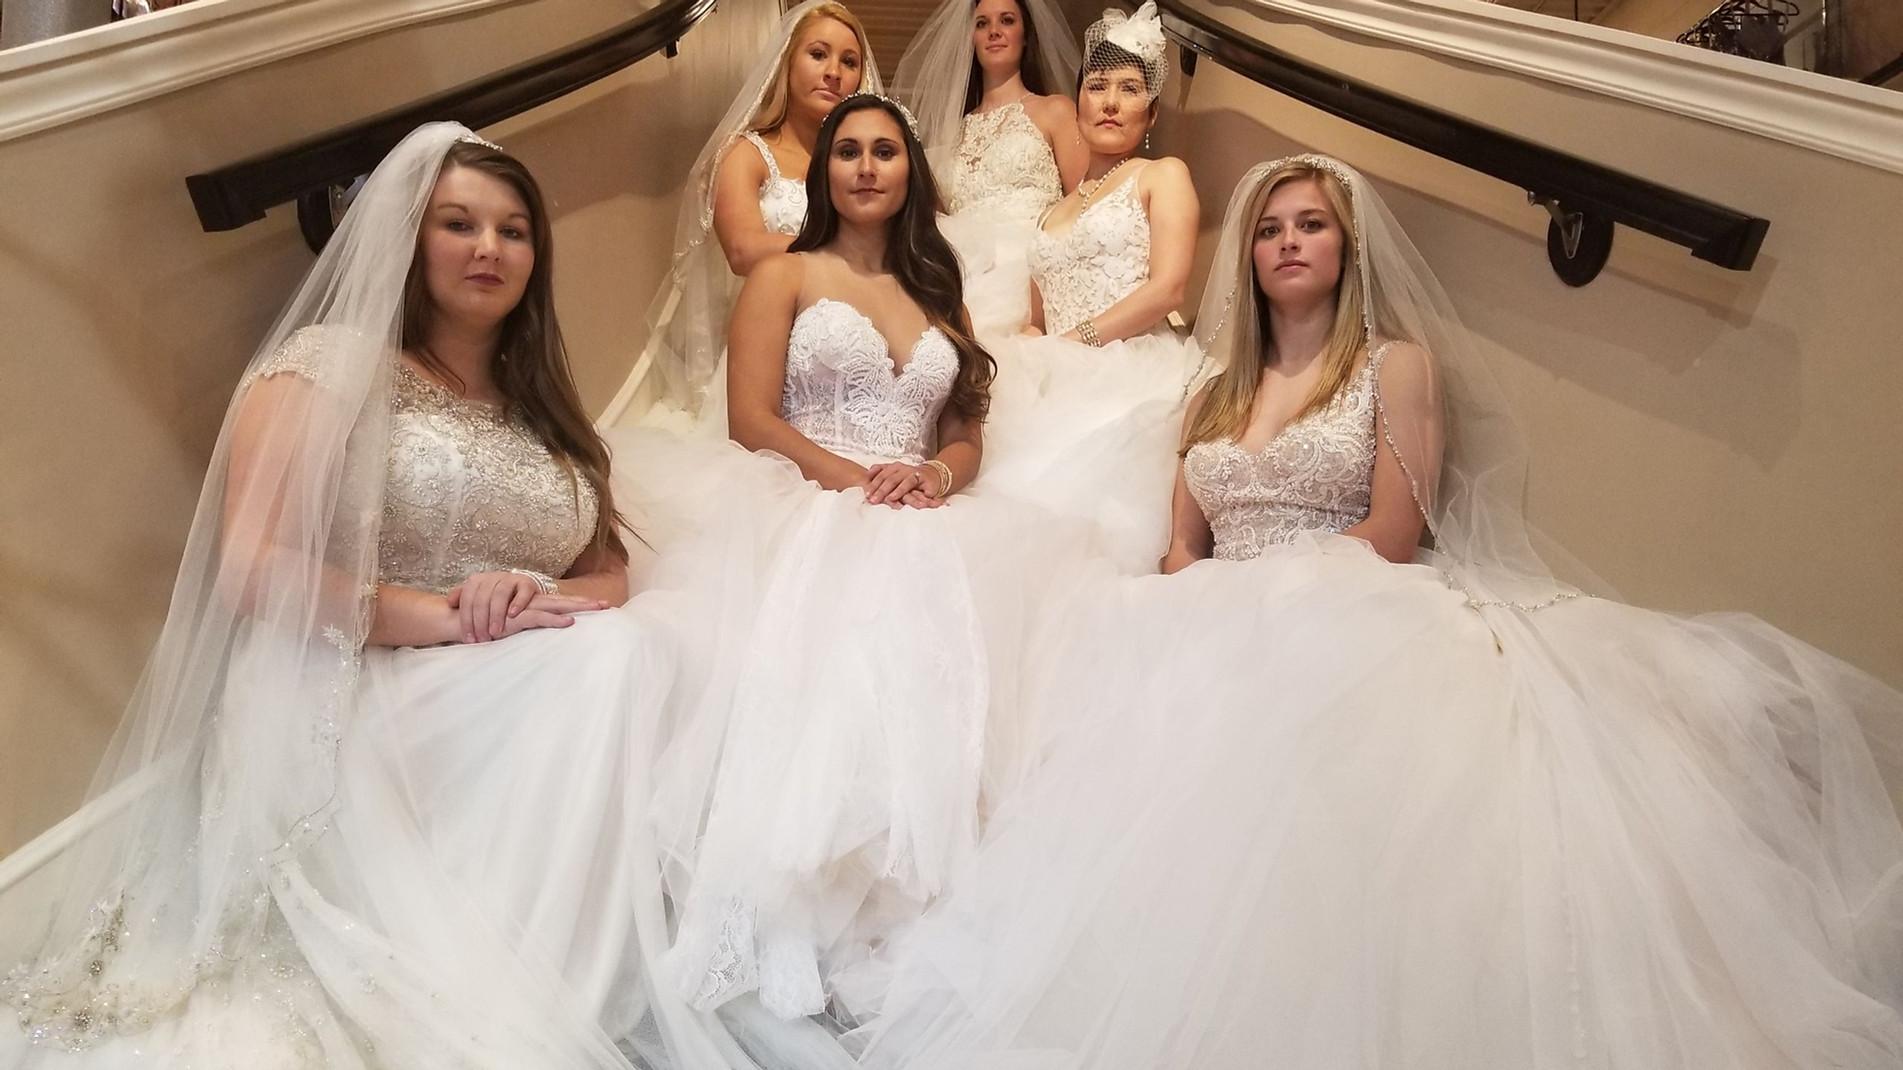 brides2_edited.jpg